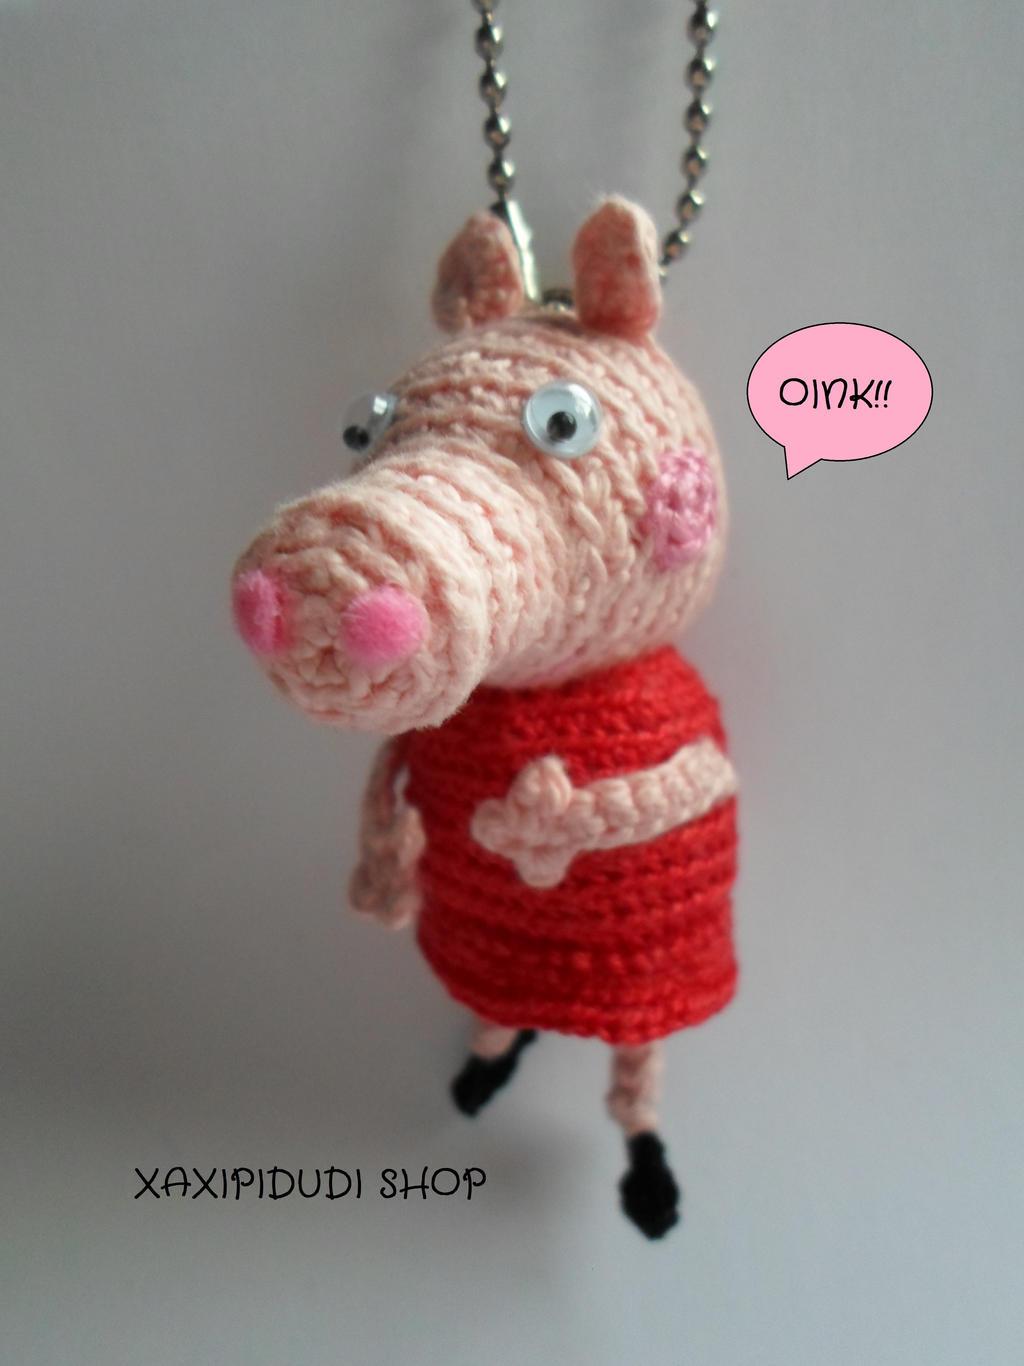 Peppa Pig Crochet Pattern Amigurumi Pig Amigurumi Peppa Pig   Etsy   1366x1024